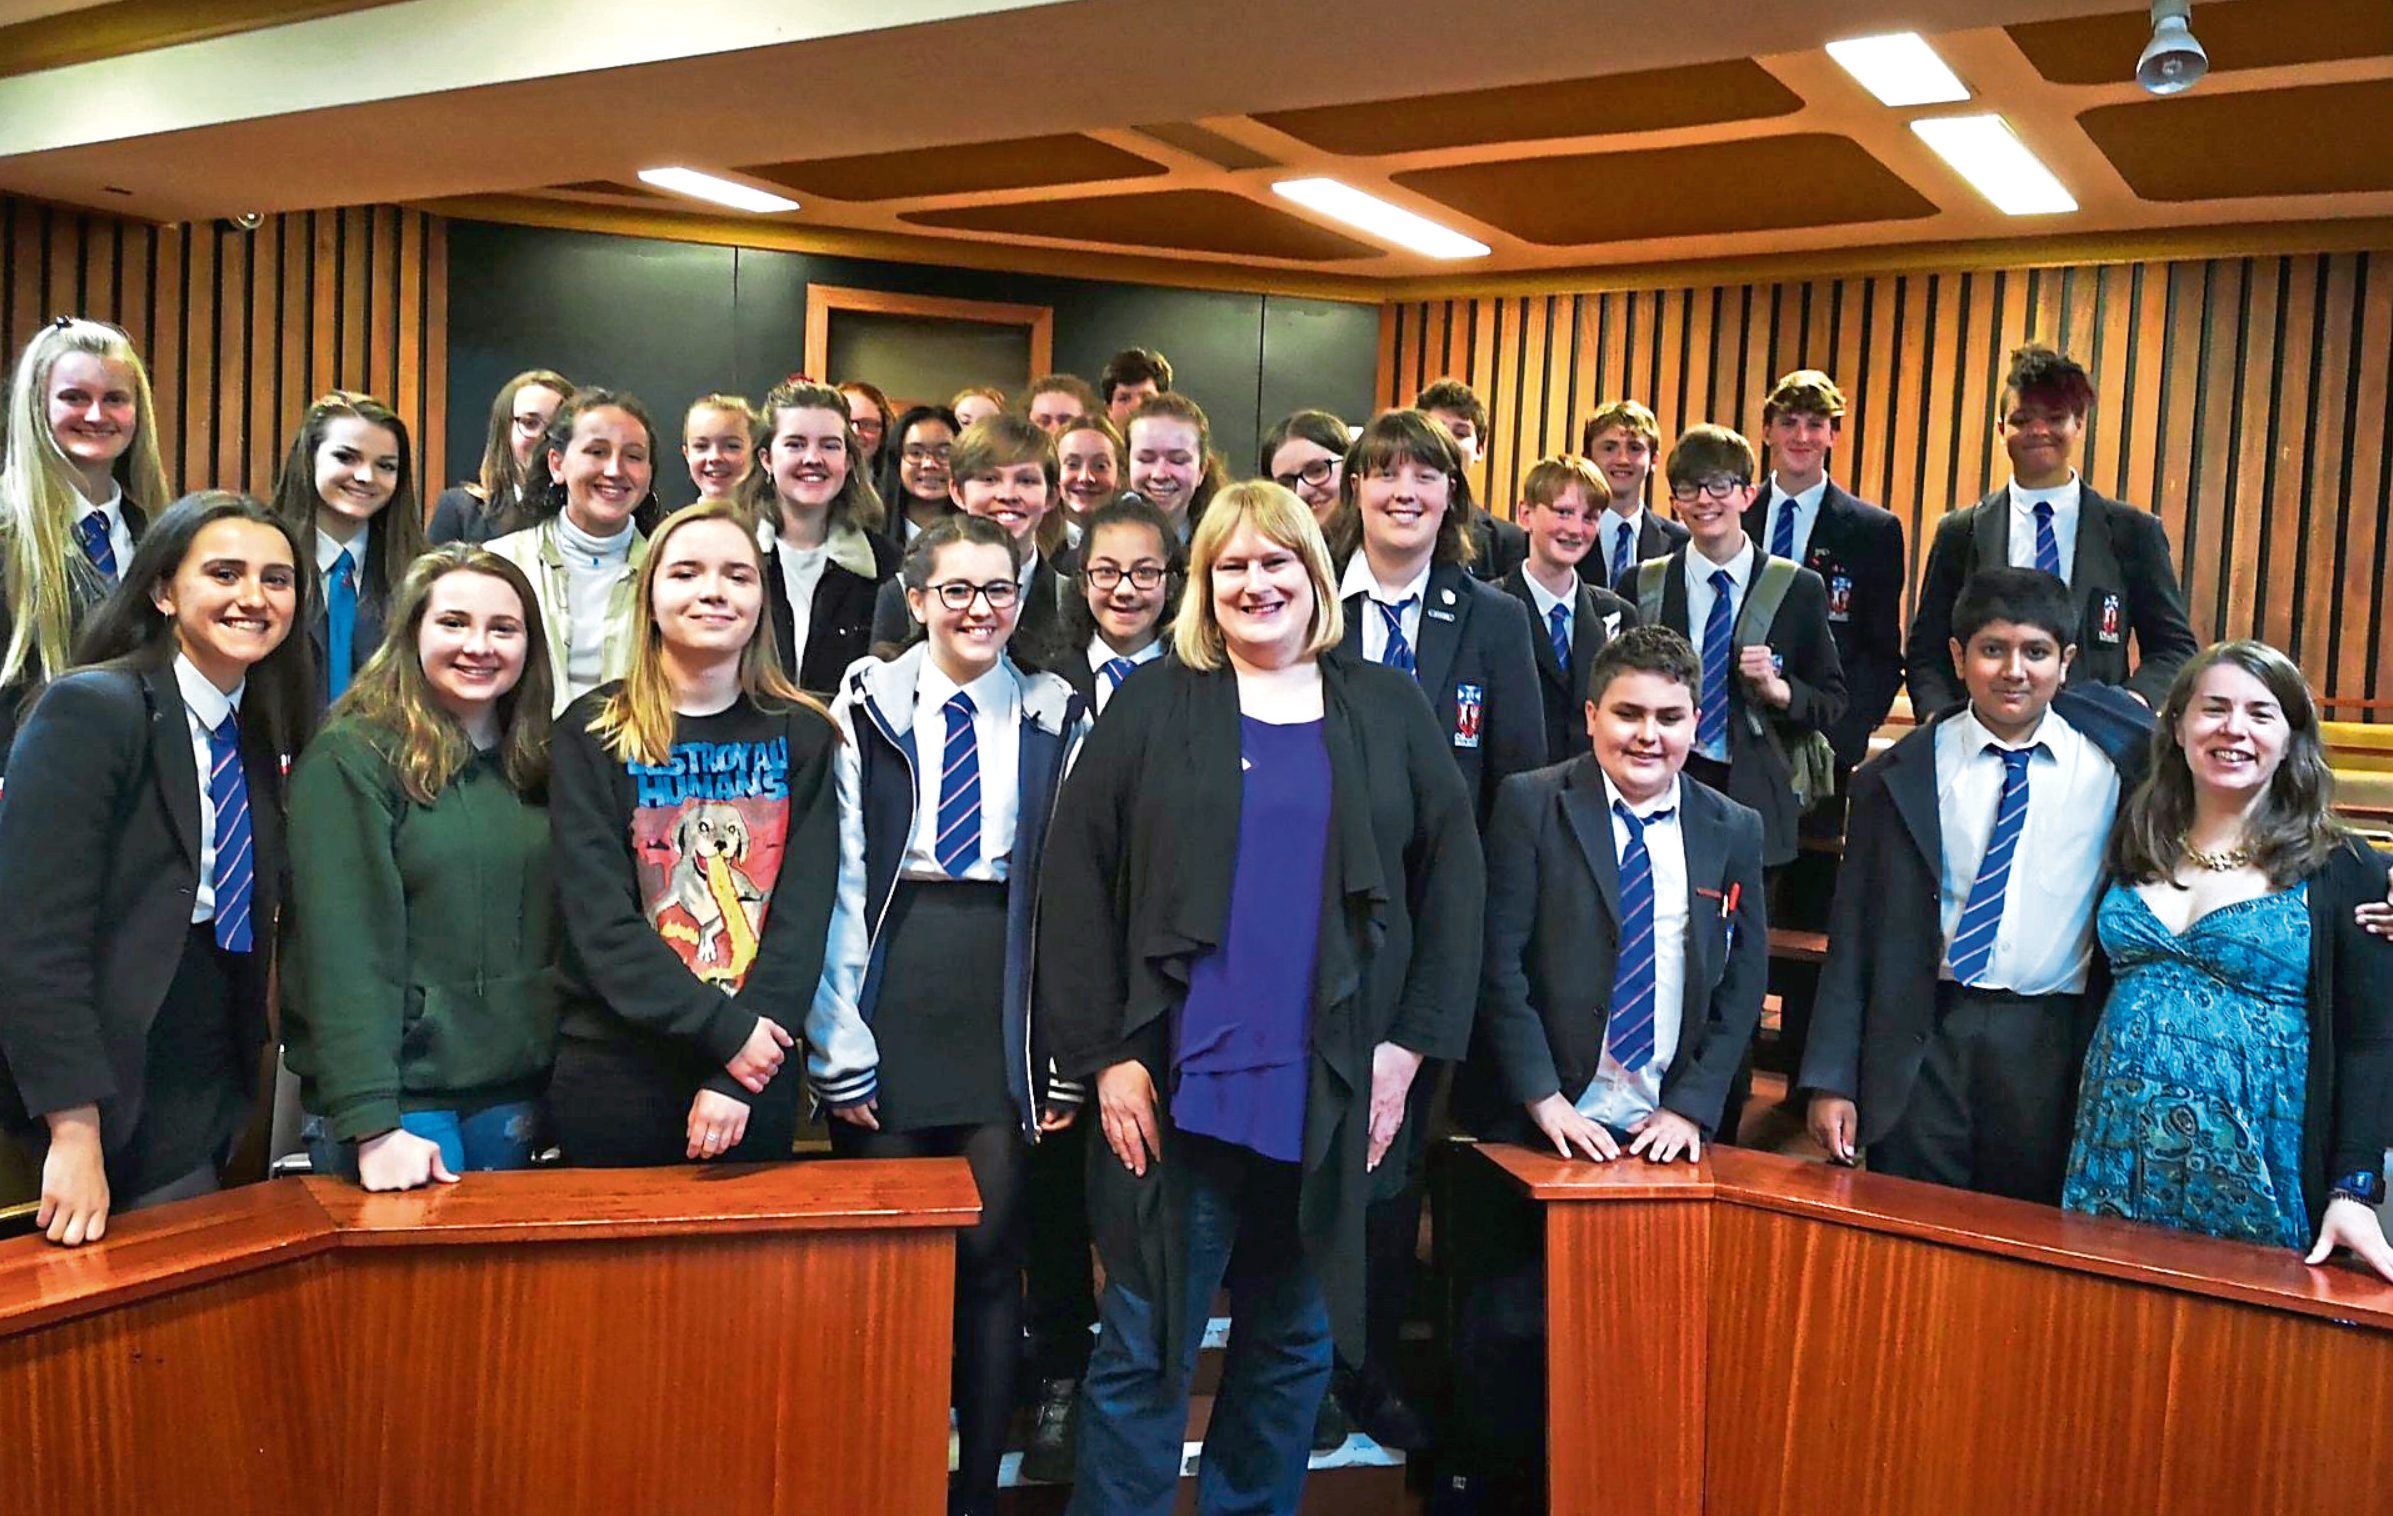 Hollyoaks actress Annie Wallace with senior pupils at Aberdeen Grammar School